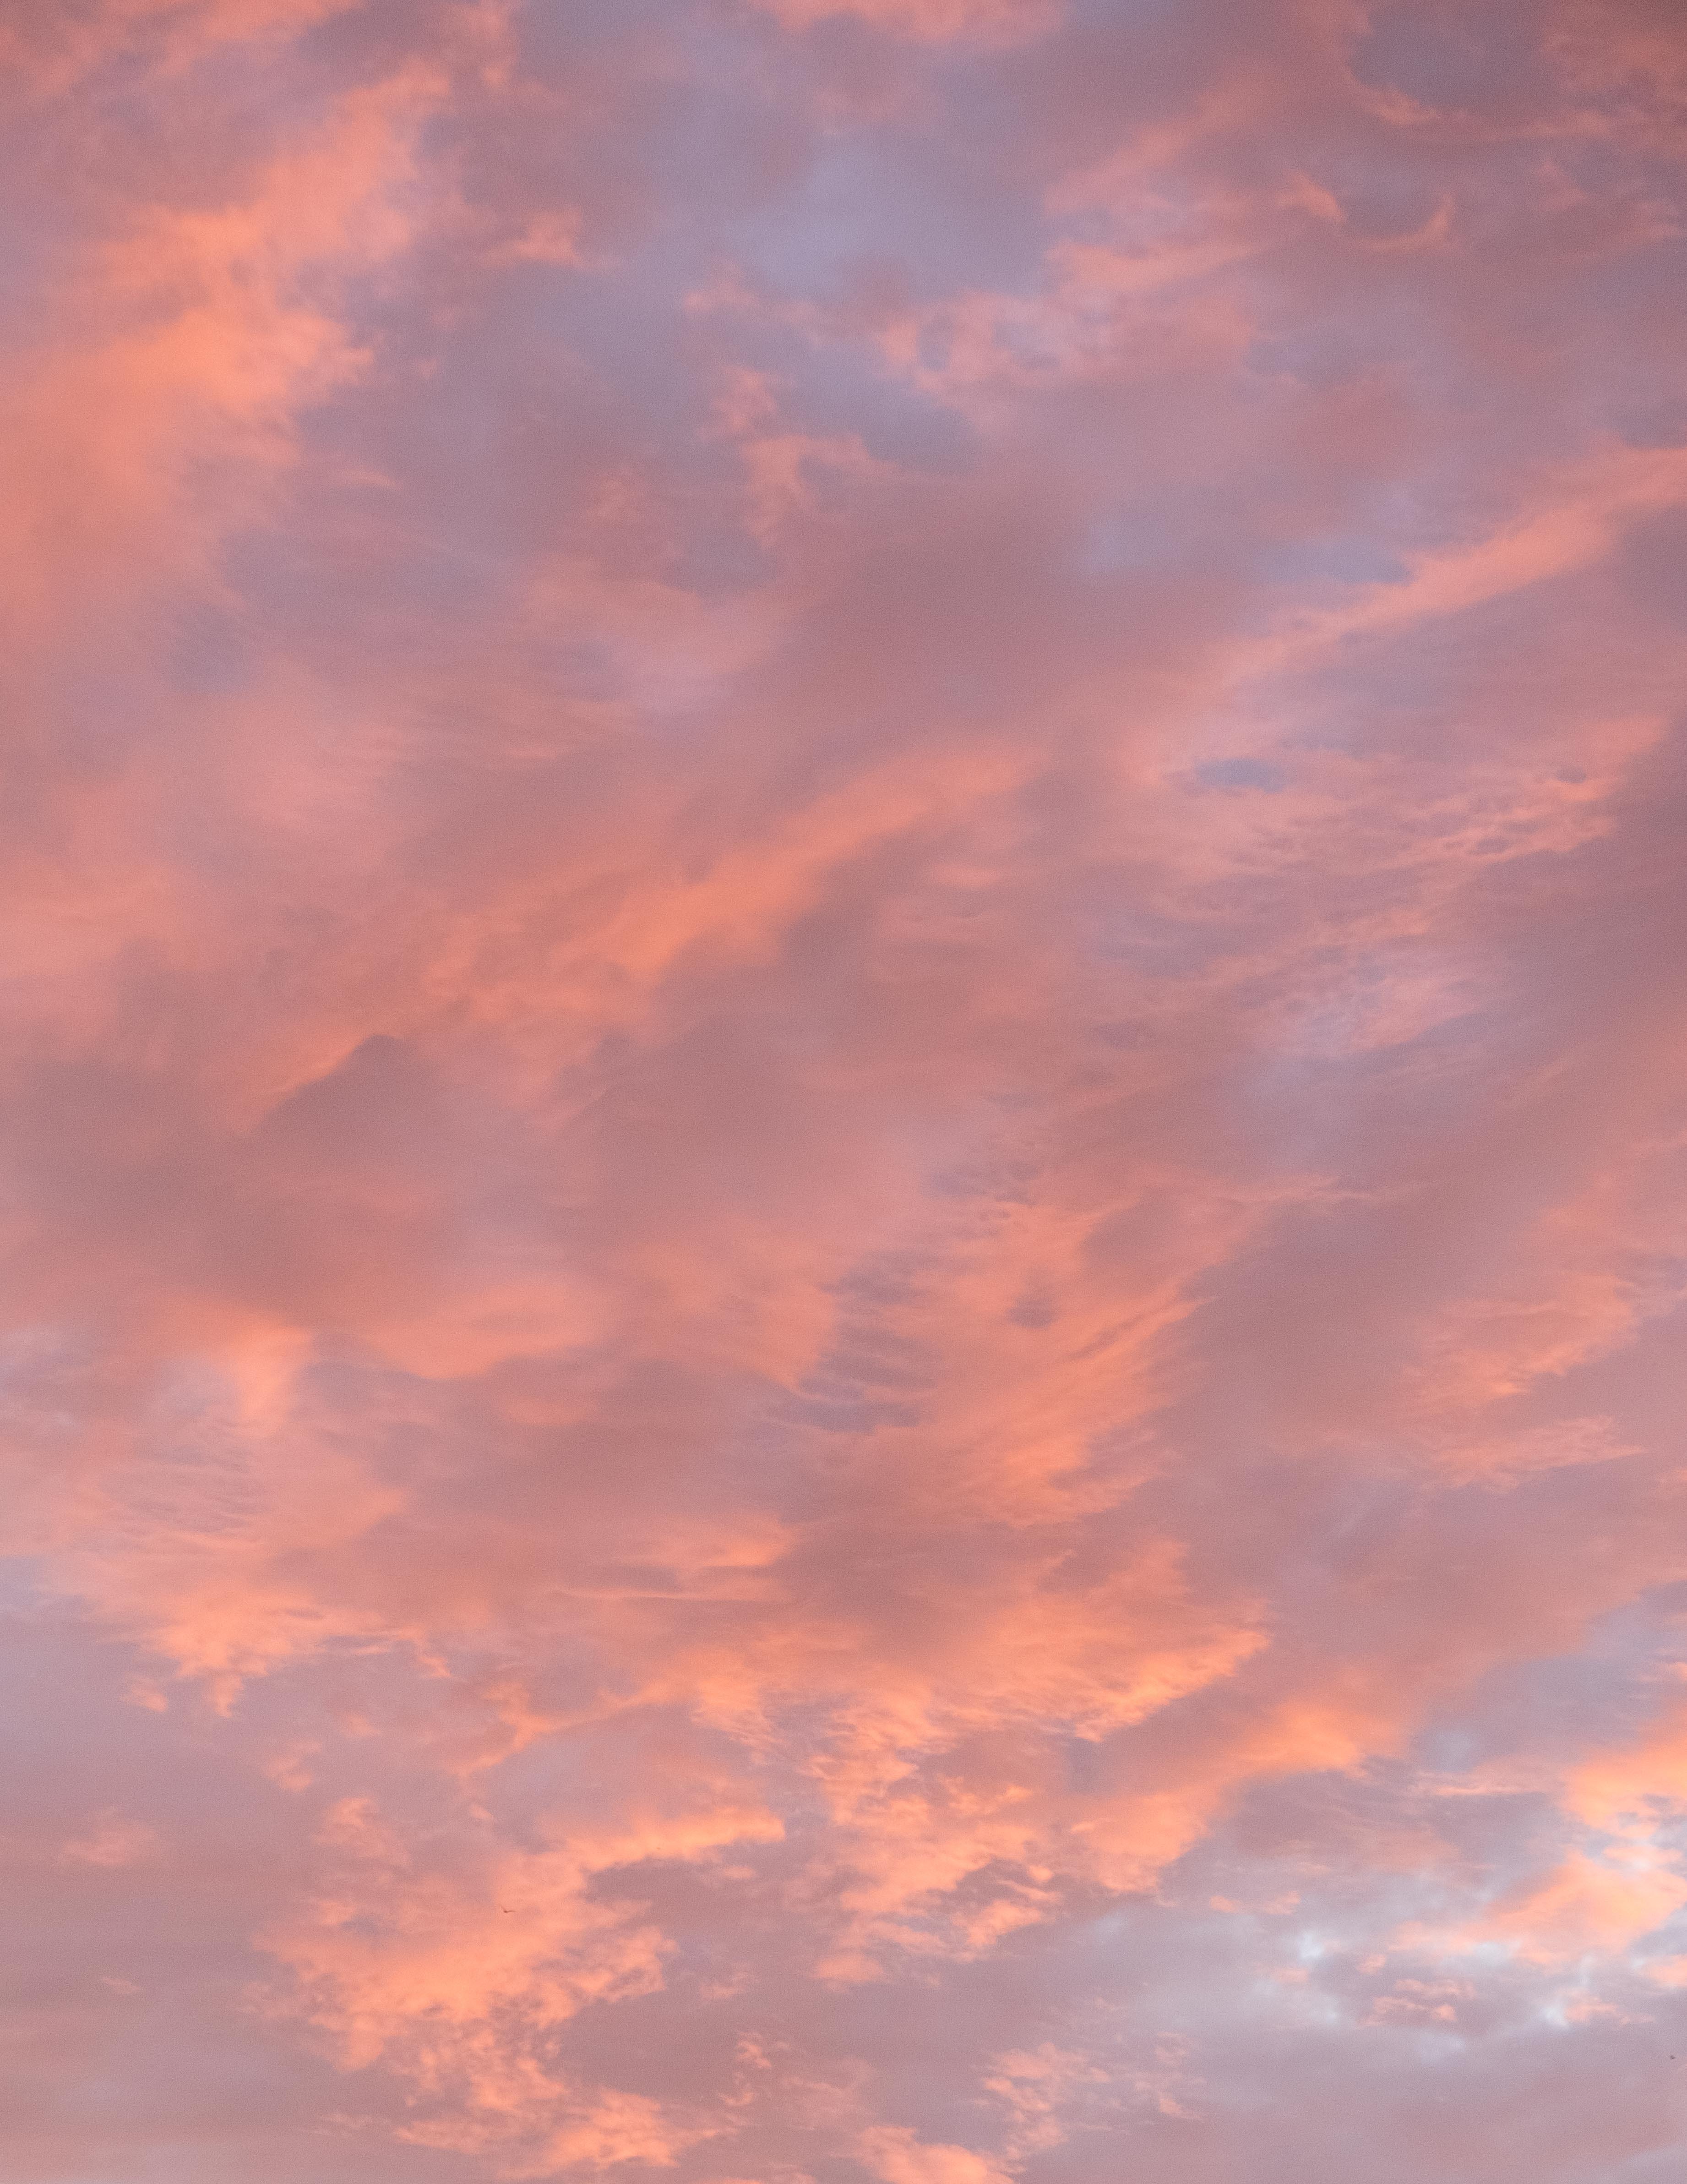 154563 скачать обои Природа, Небо, Закат, Облака, Вечер - заставки и картинки бесплатно